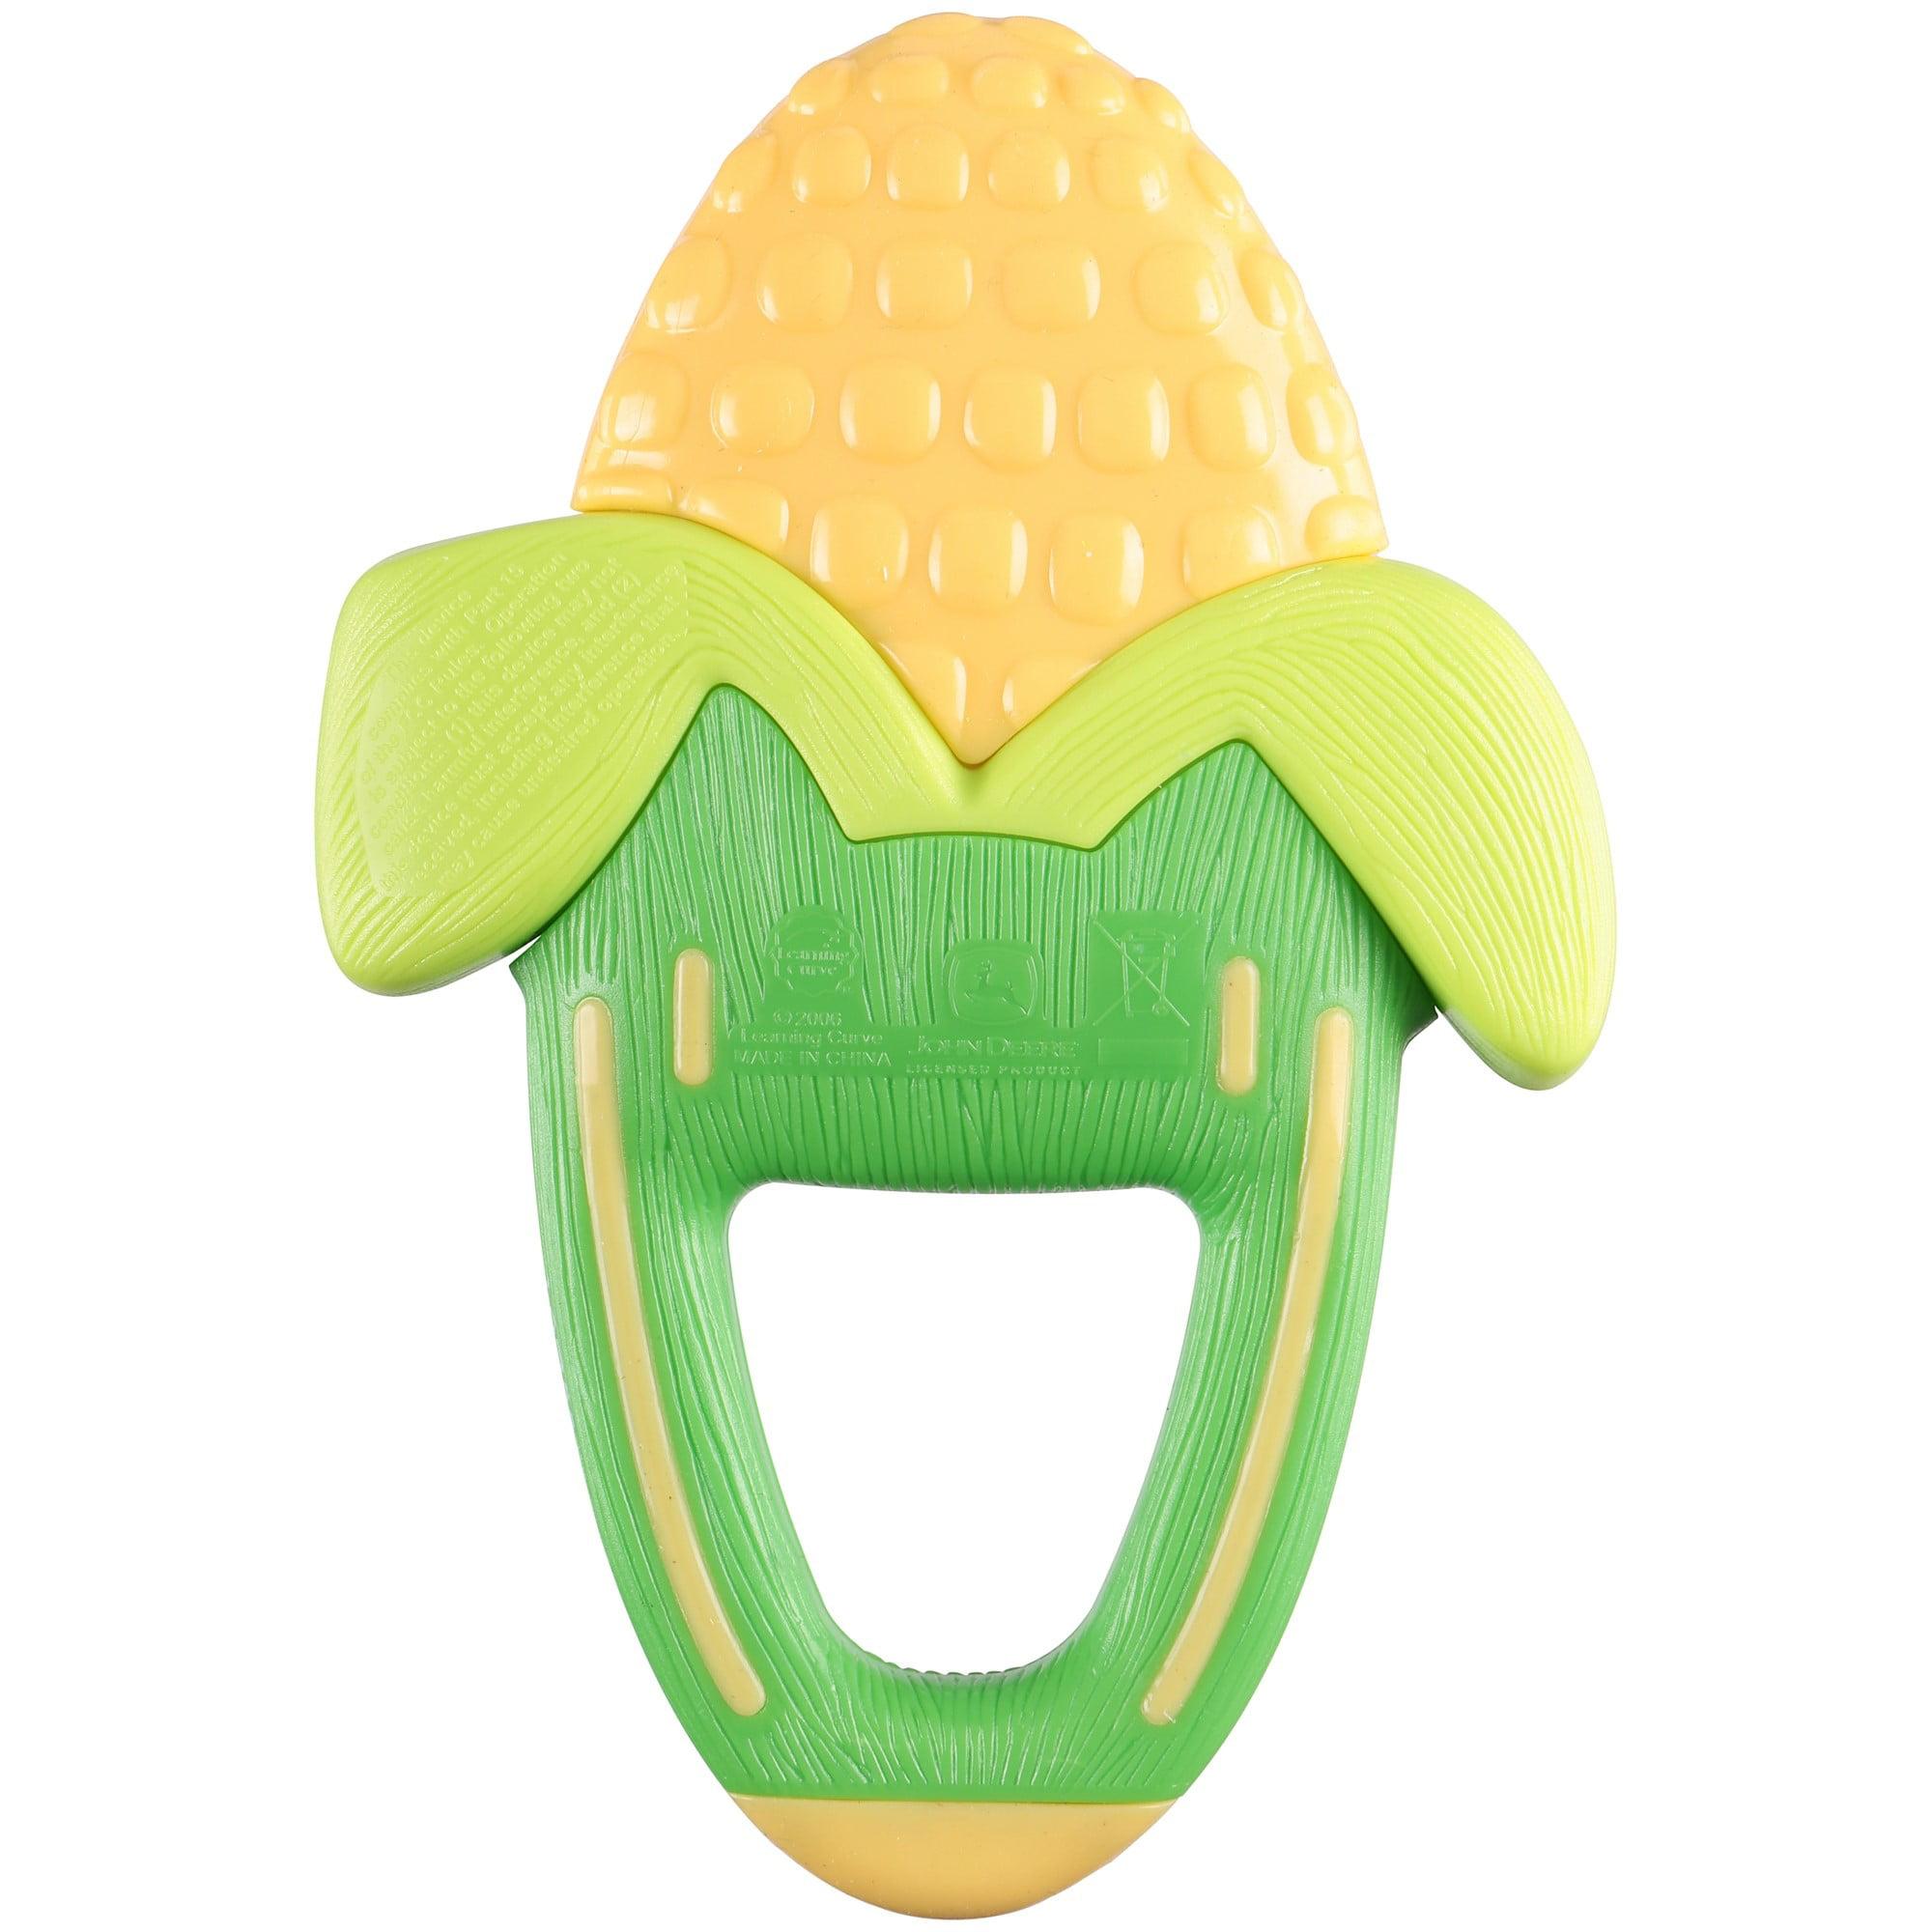 The First Years John Deere Massaging Corn Teether